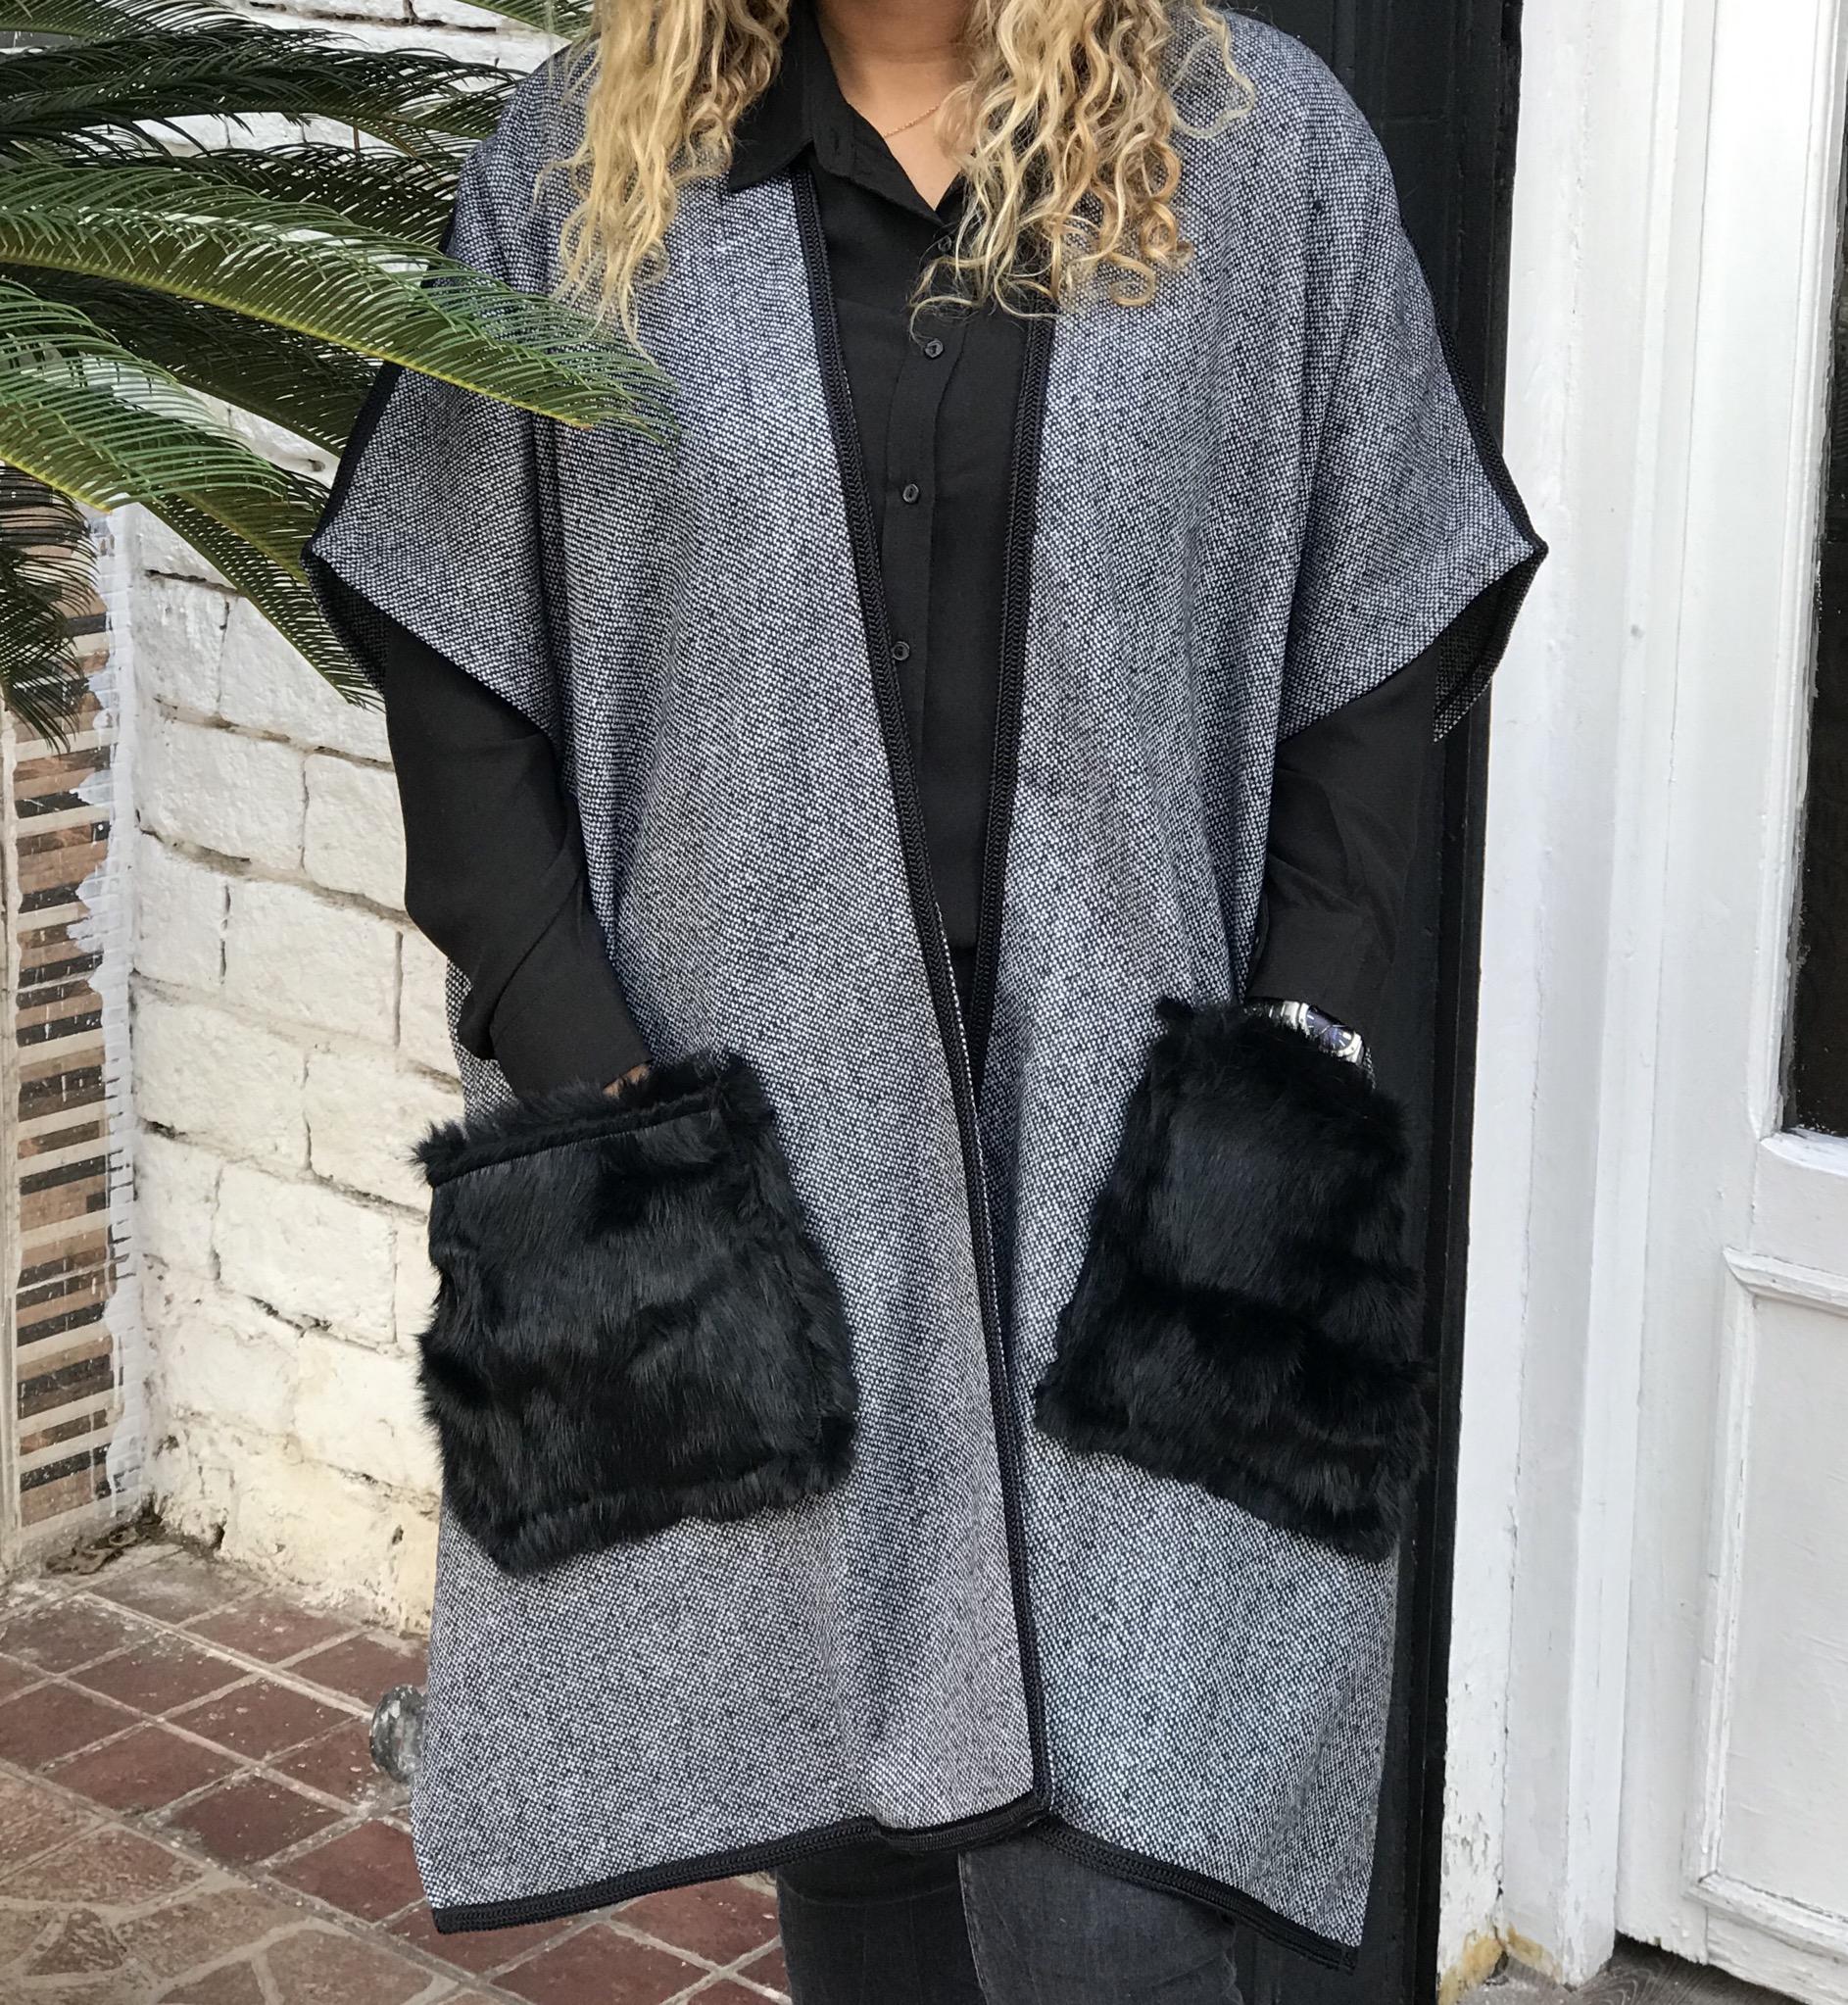 Kimono tweed grey with sfifa black & fur pockets